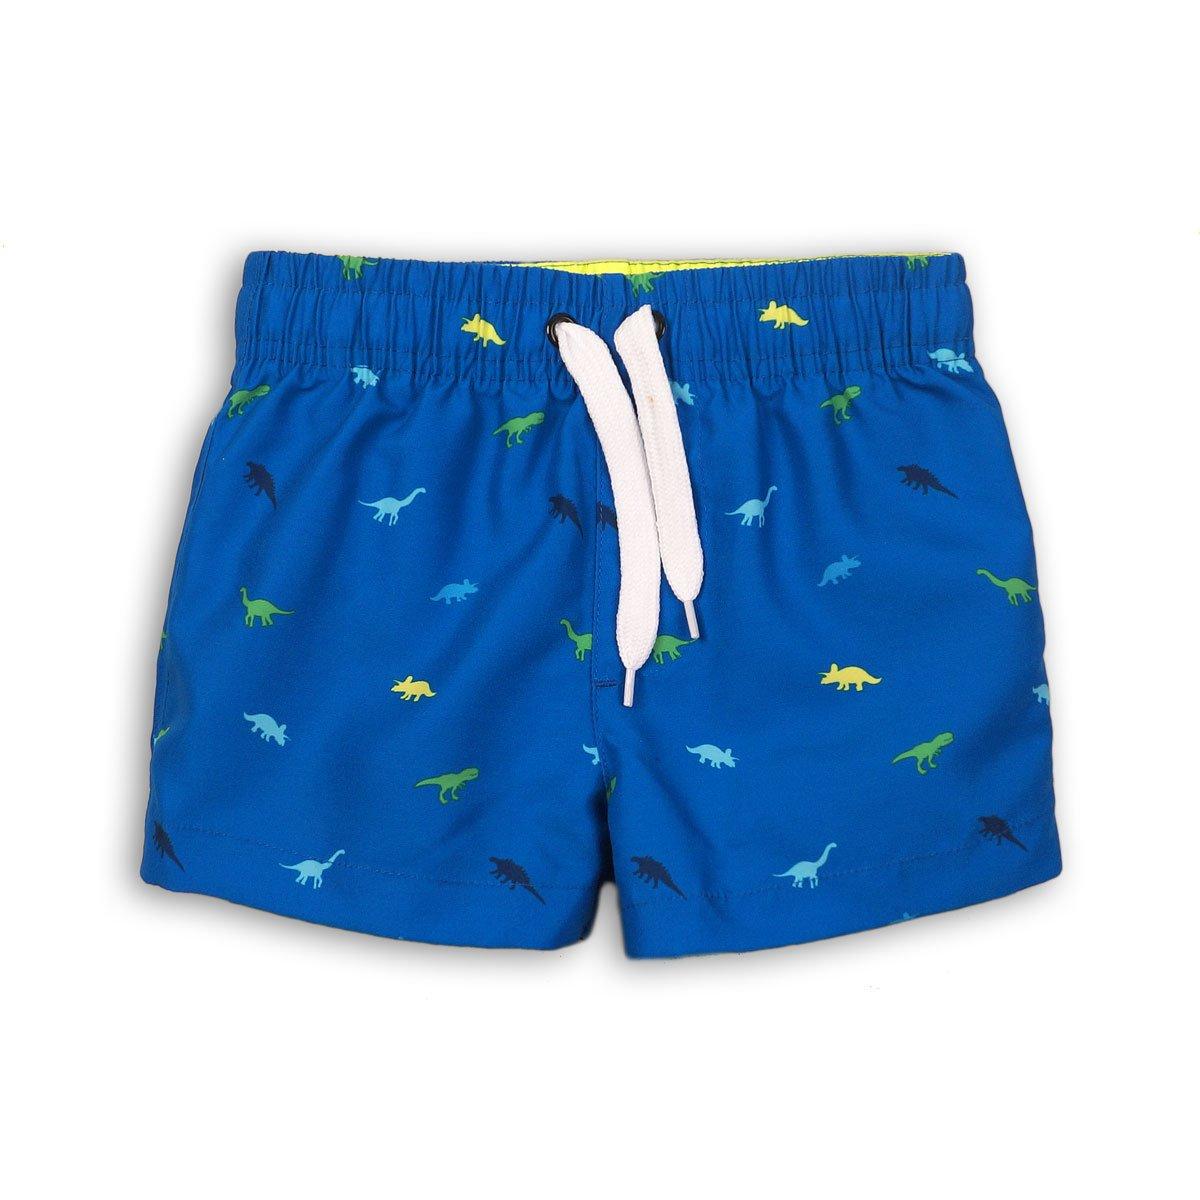 Pantaloni scurti cu imprimeu total, Minoti Basic 22331613